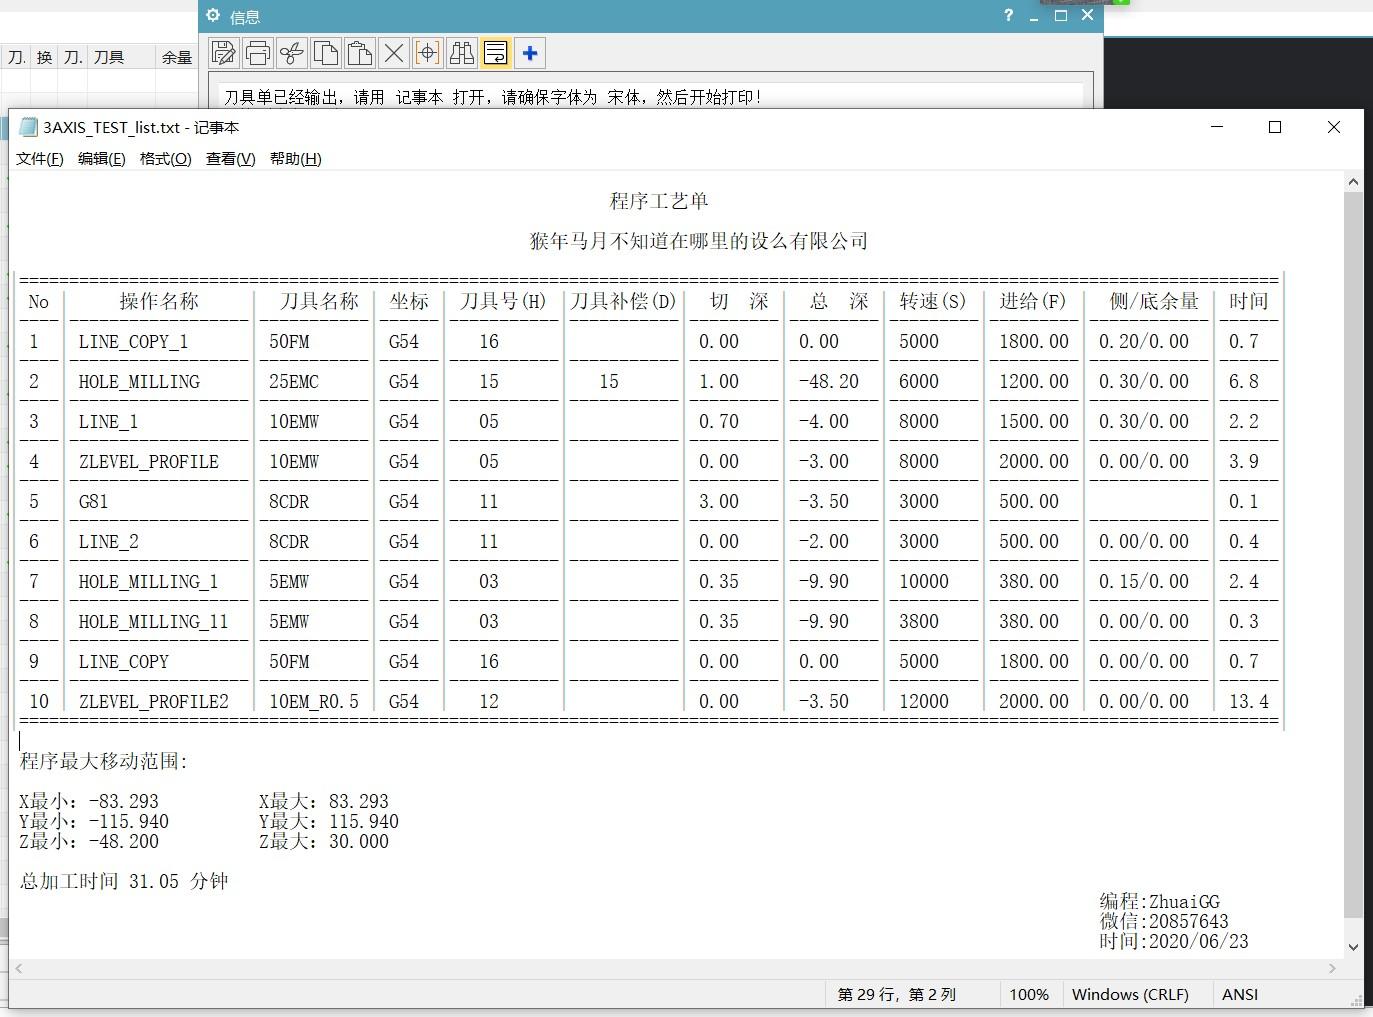 attachments-2020-06-qJRao7lT5ef1e7ccc1333.png